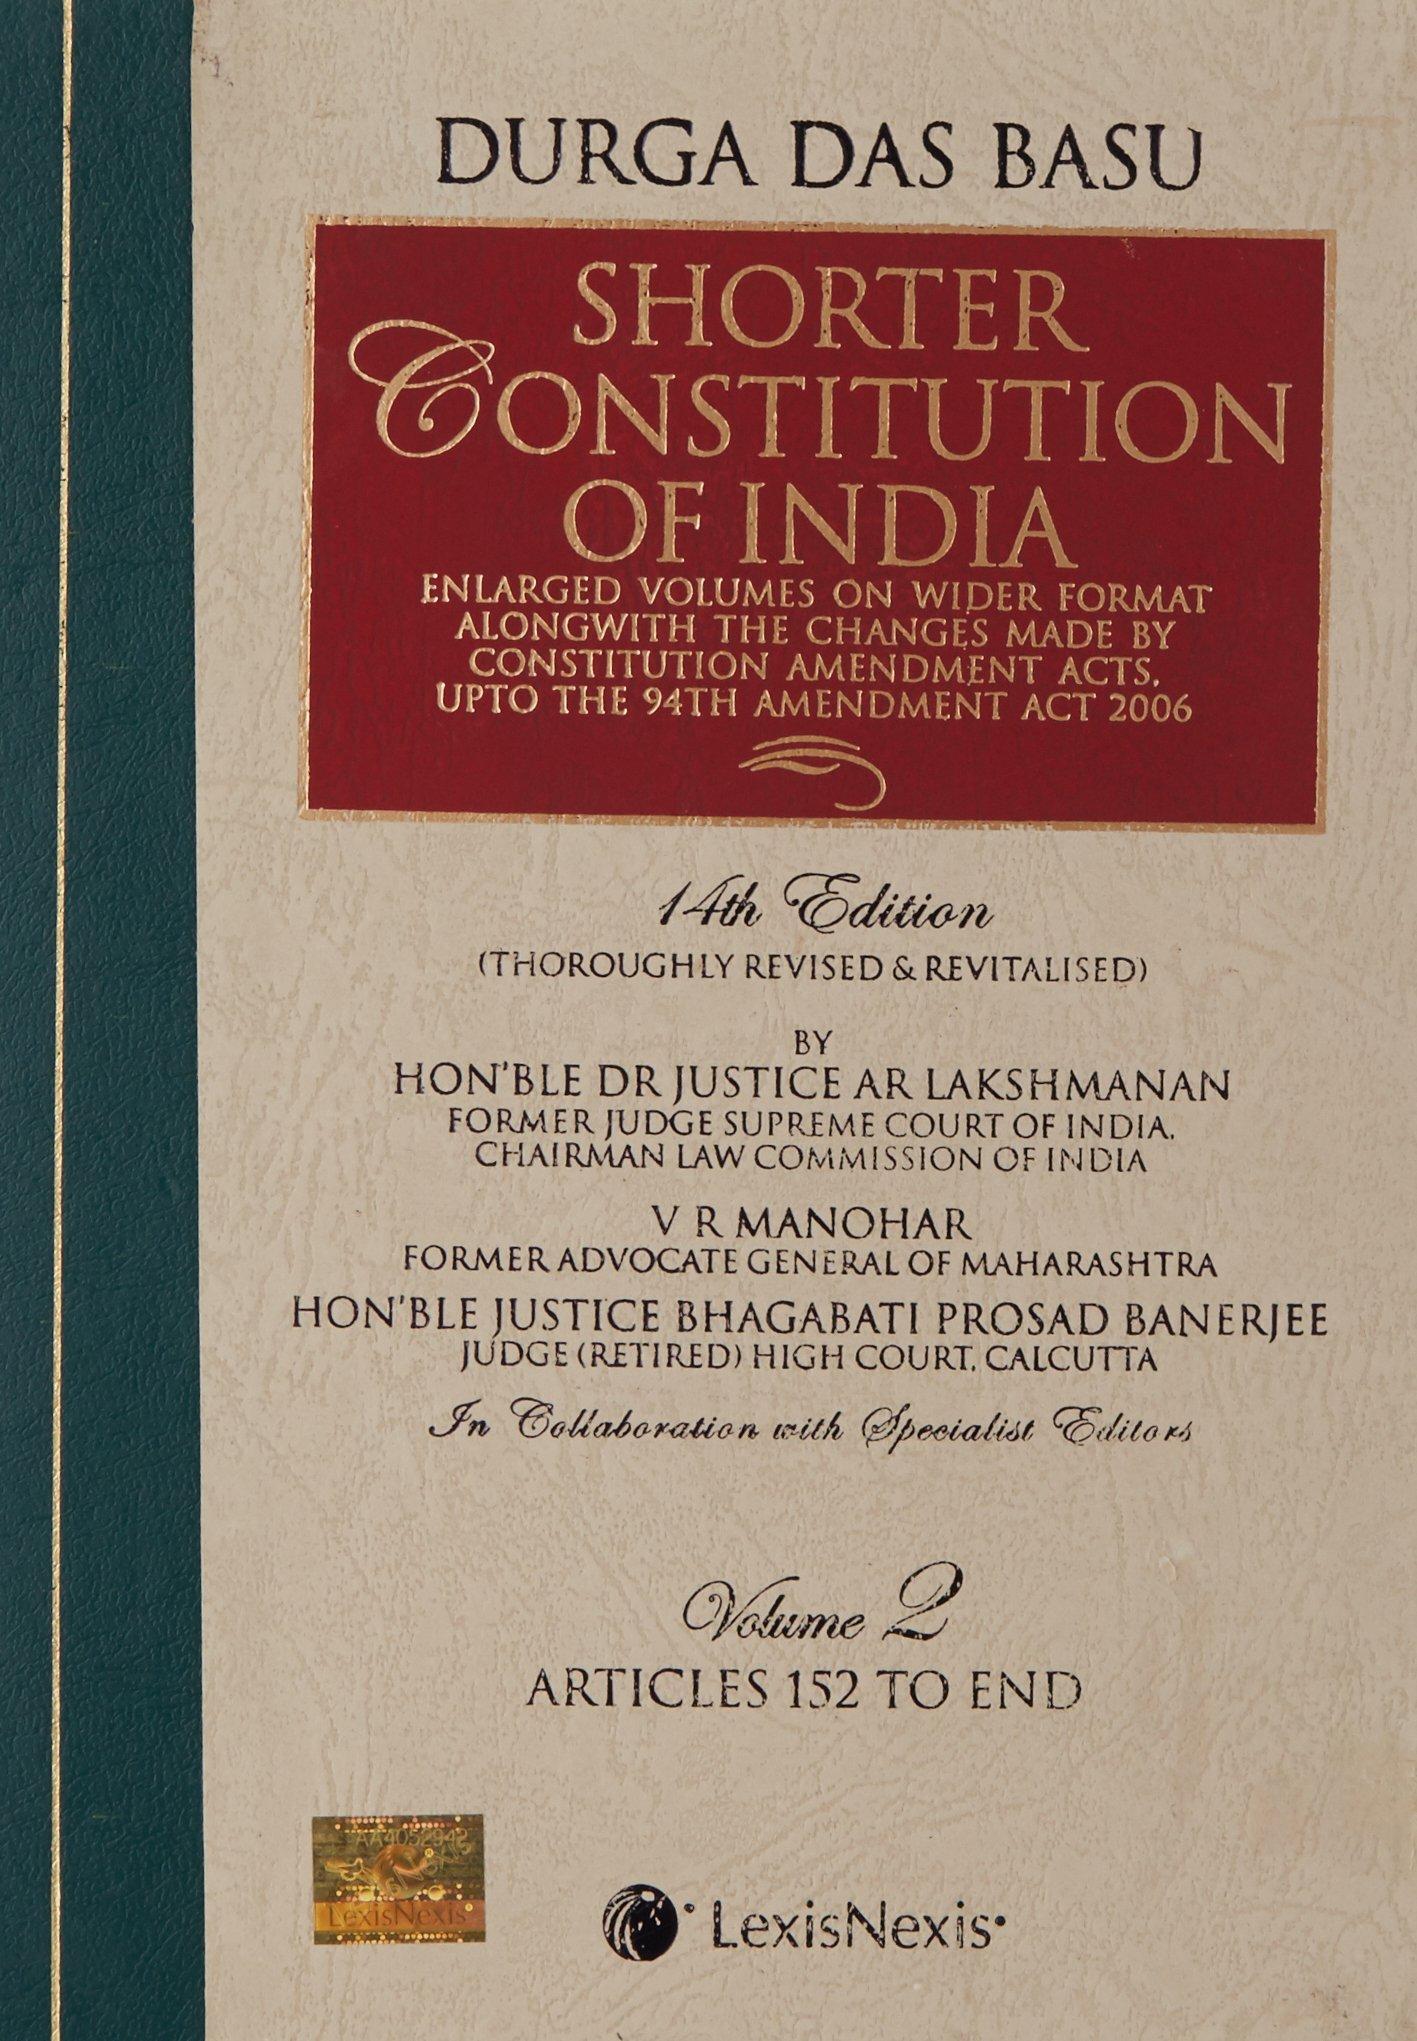 Dd Basu Constitution Of India Pdf In Hindi - poksmichael